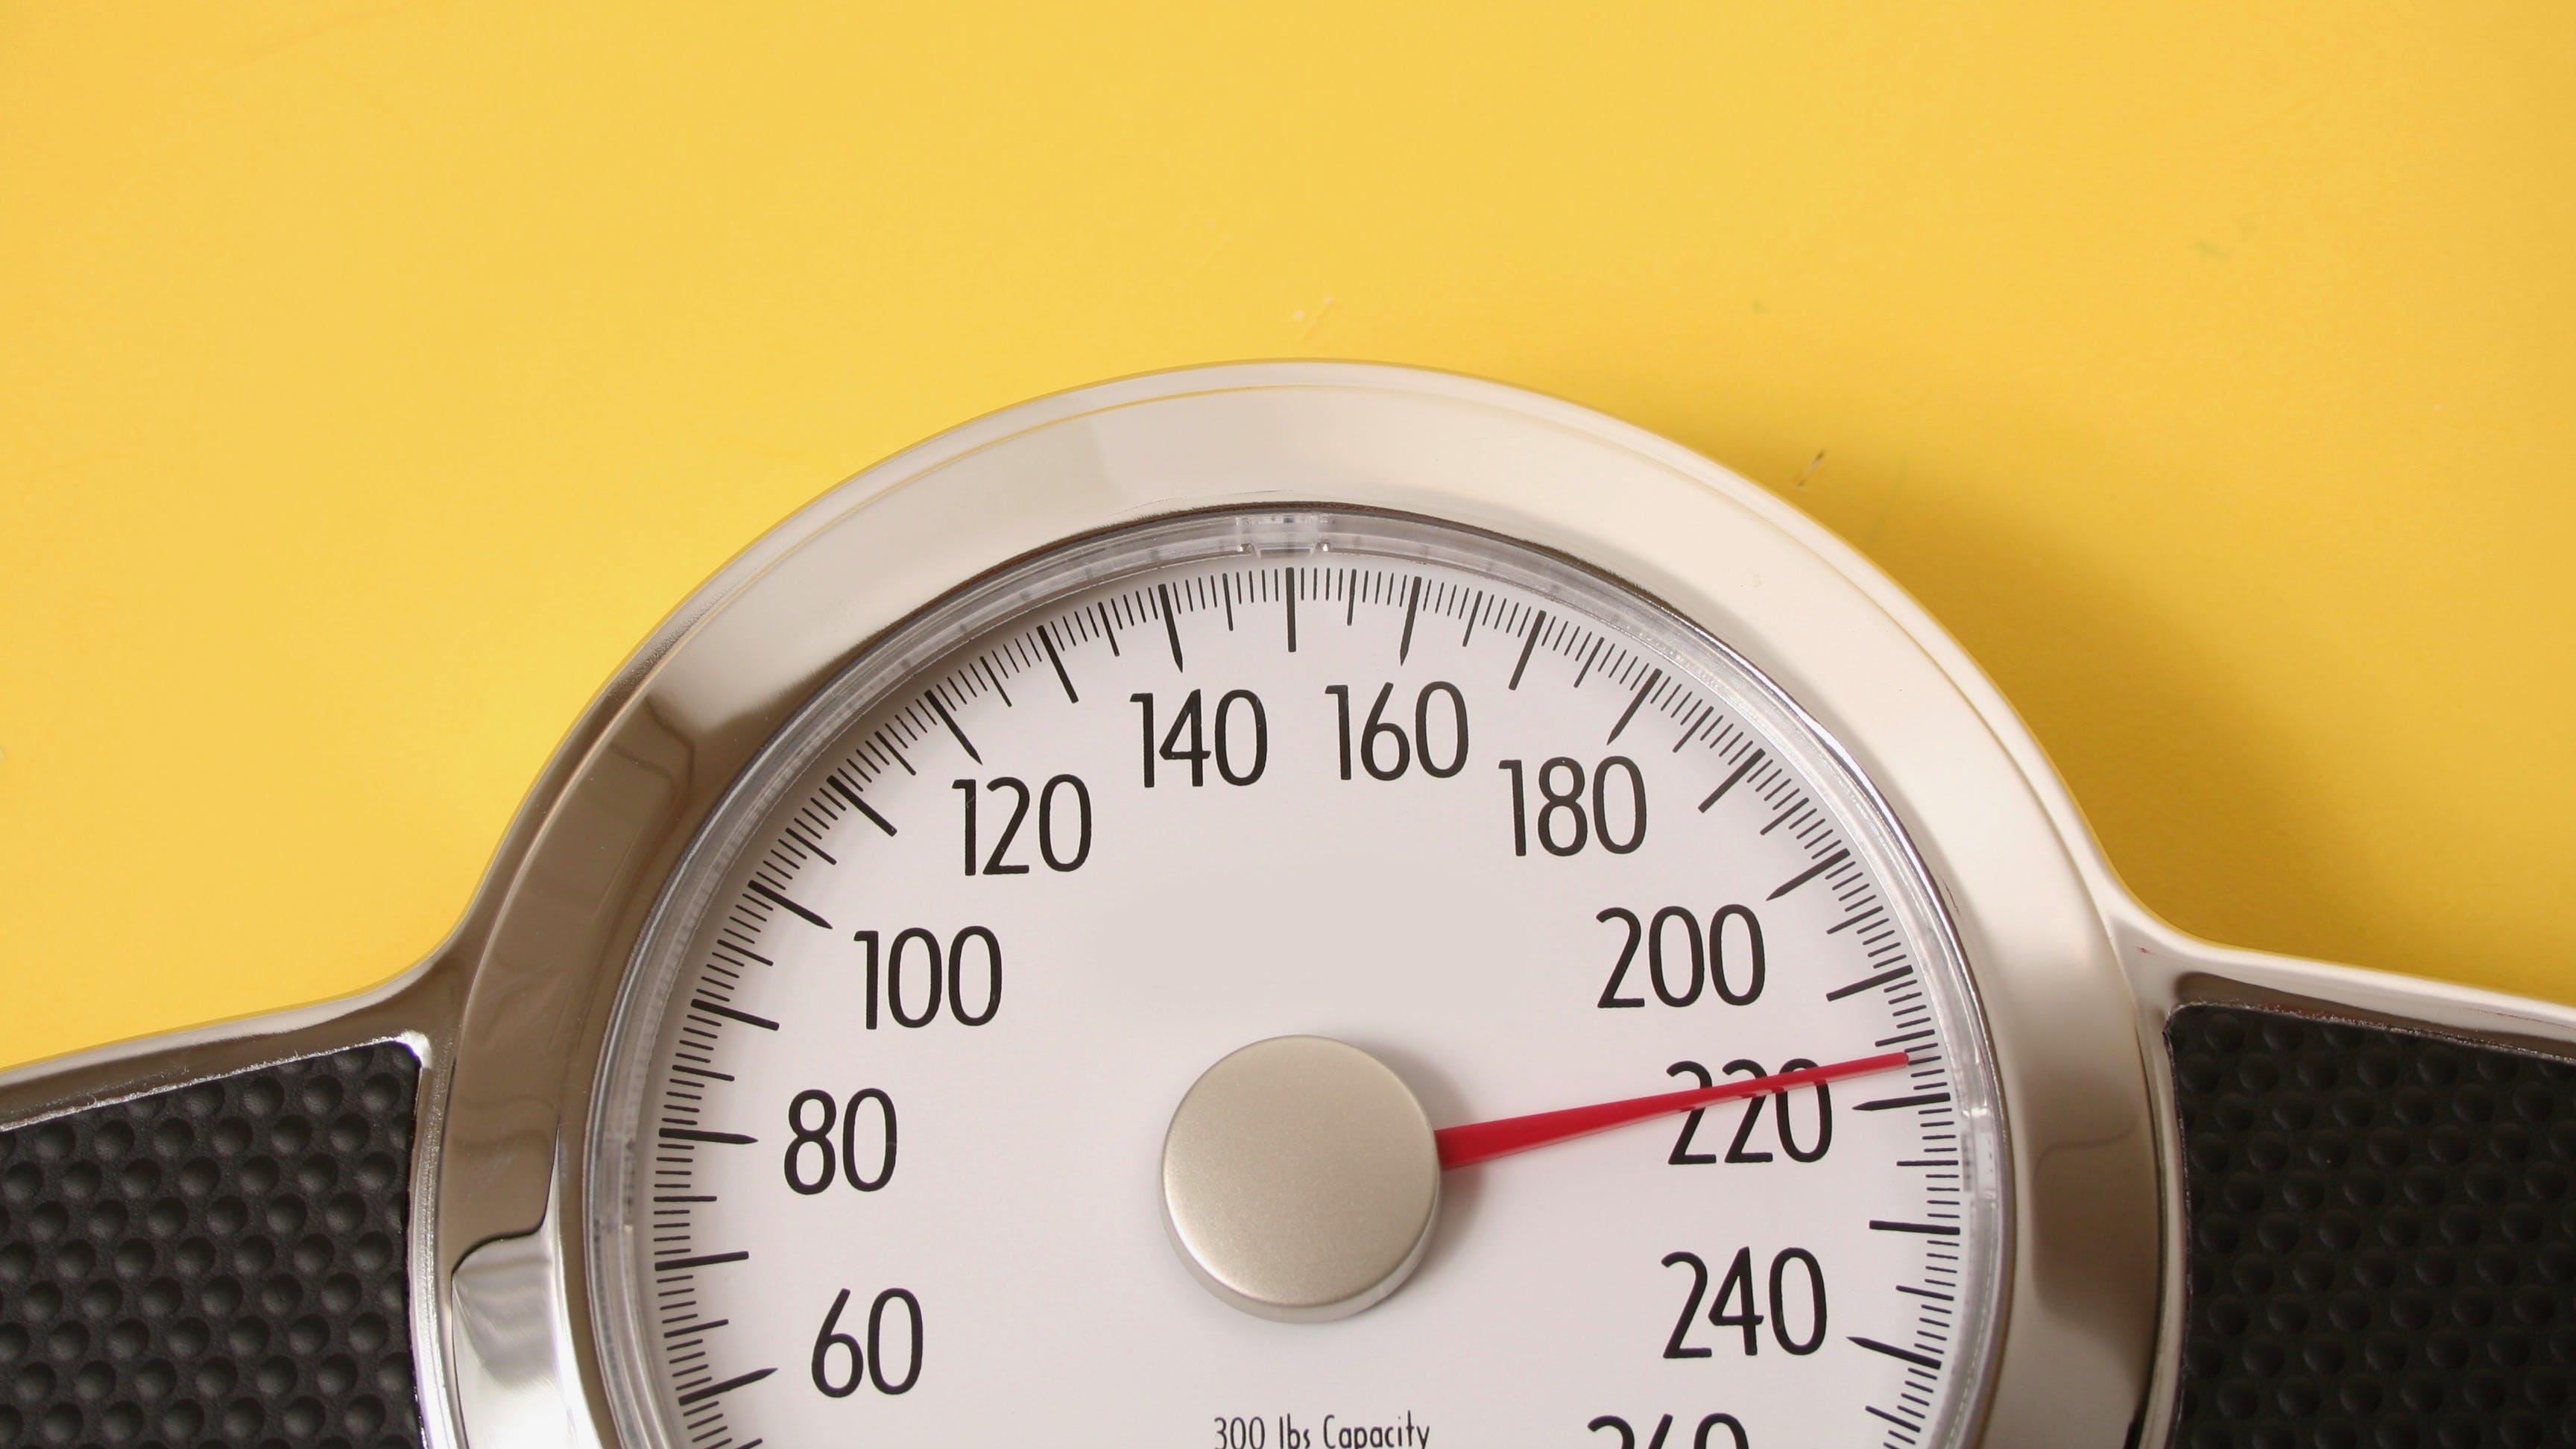 America's national crisis: childhood obesity